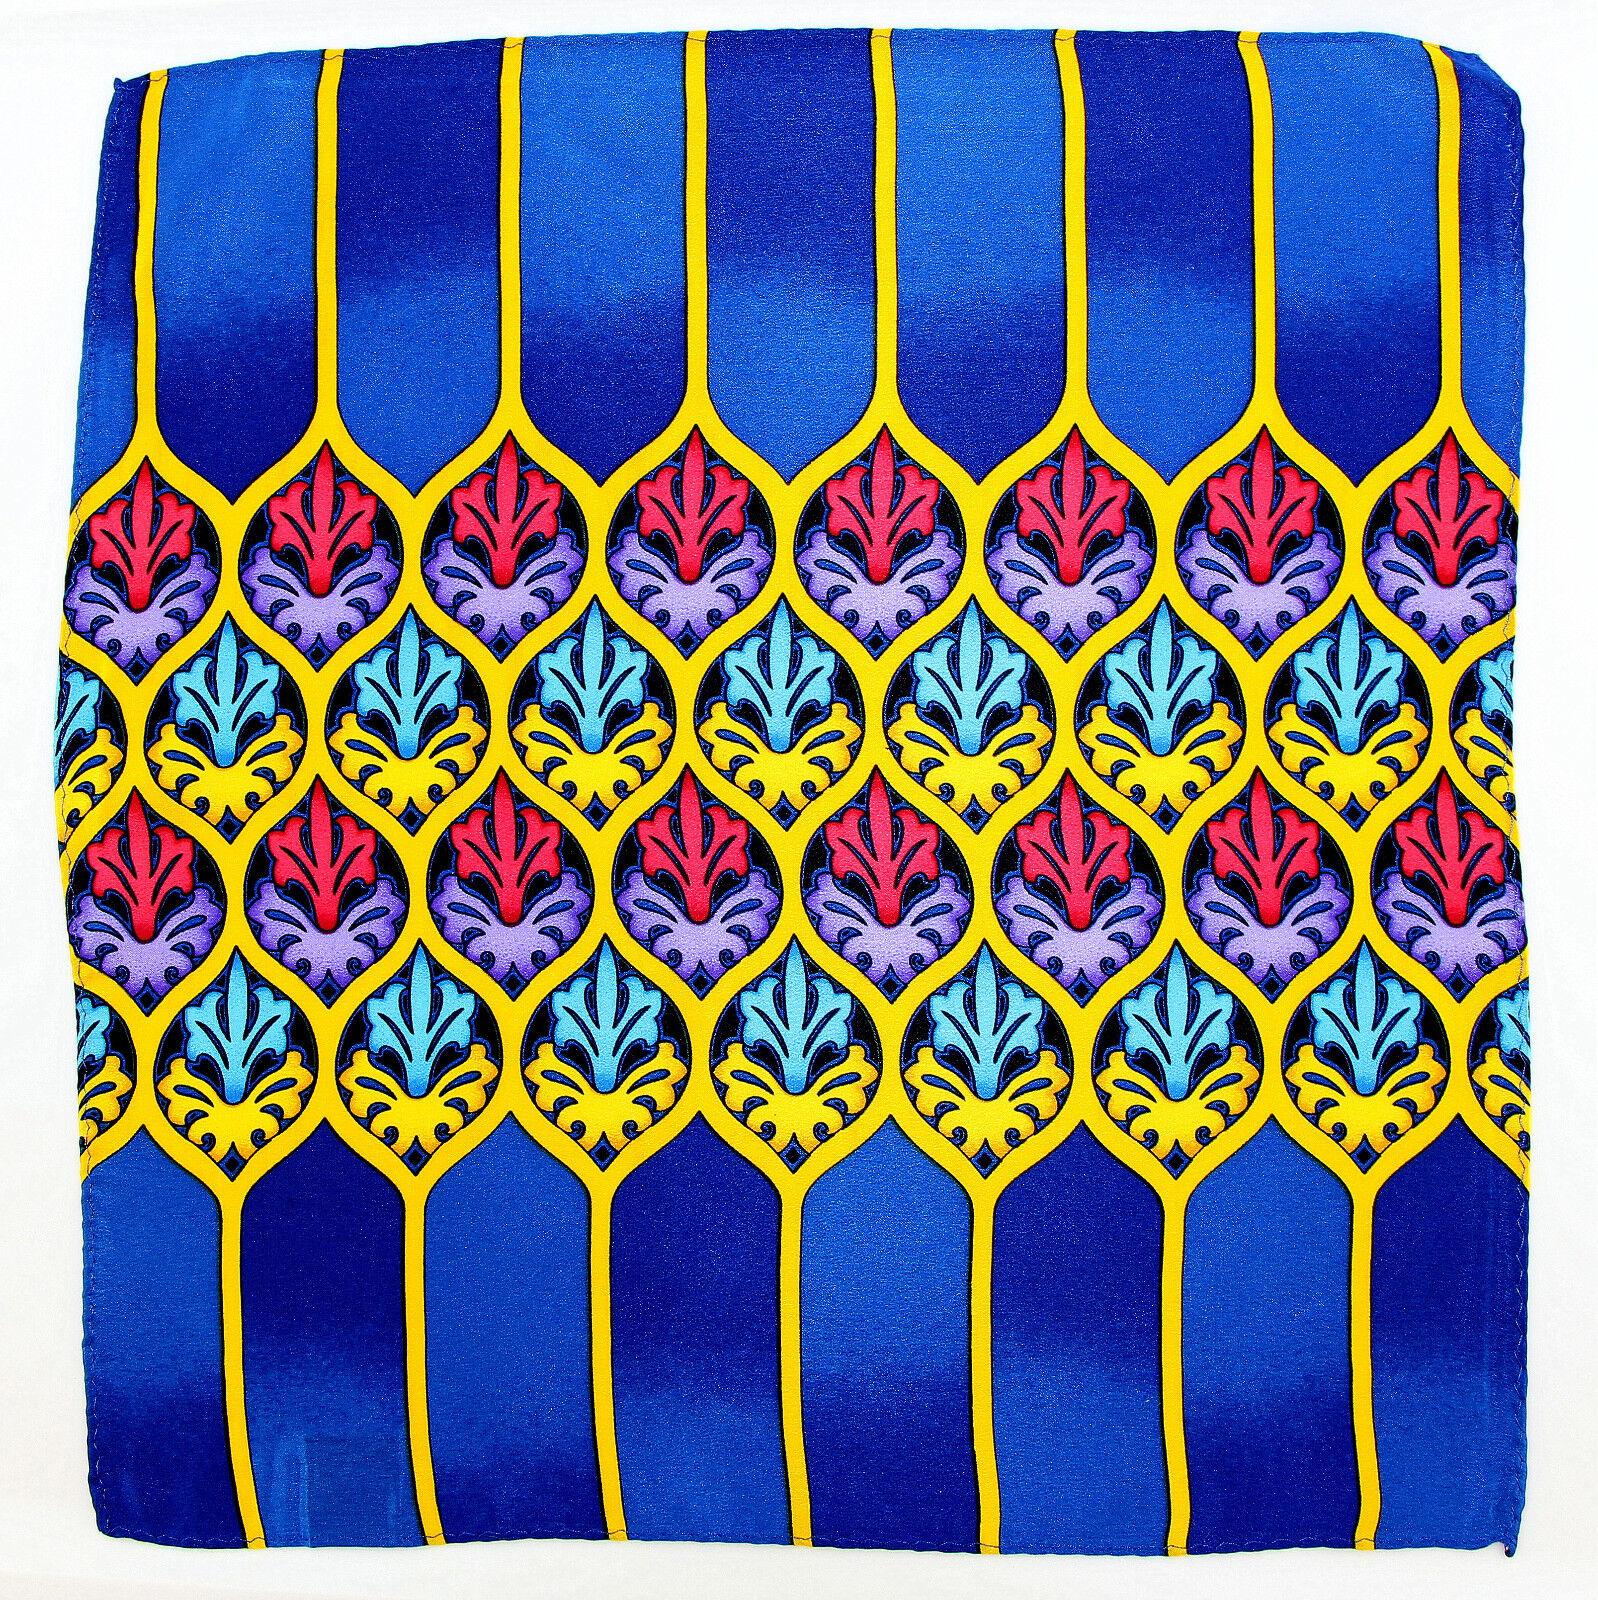 Rush Limbaugh Men's Pocket Square Handkerchief Wedding Dress Silk Blue Hanky